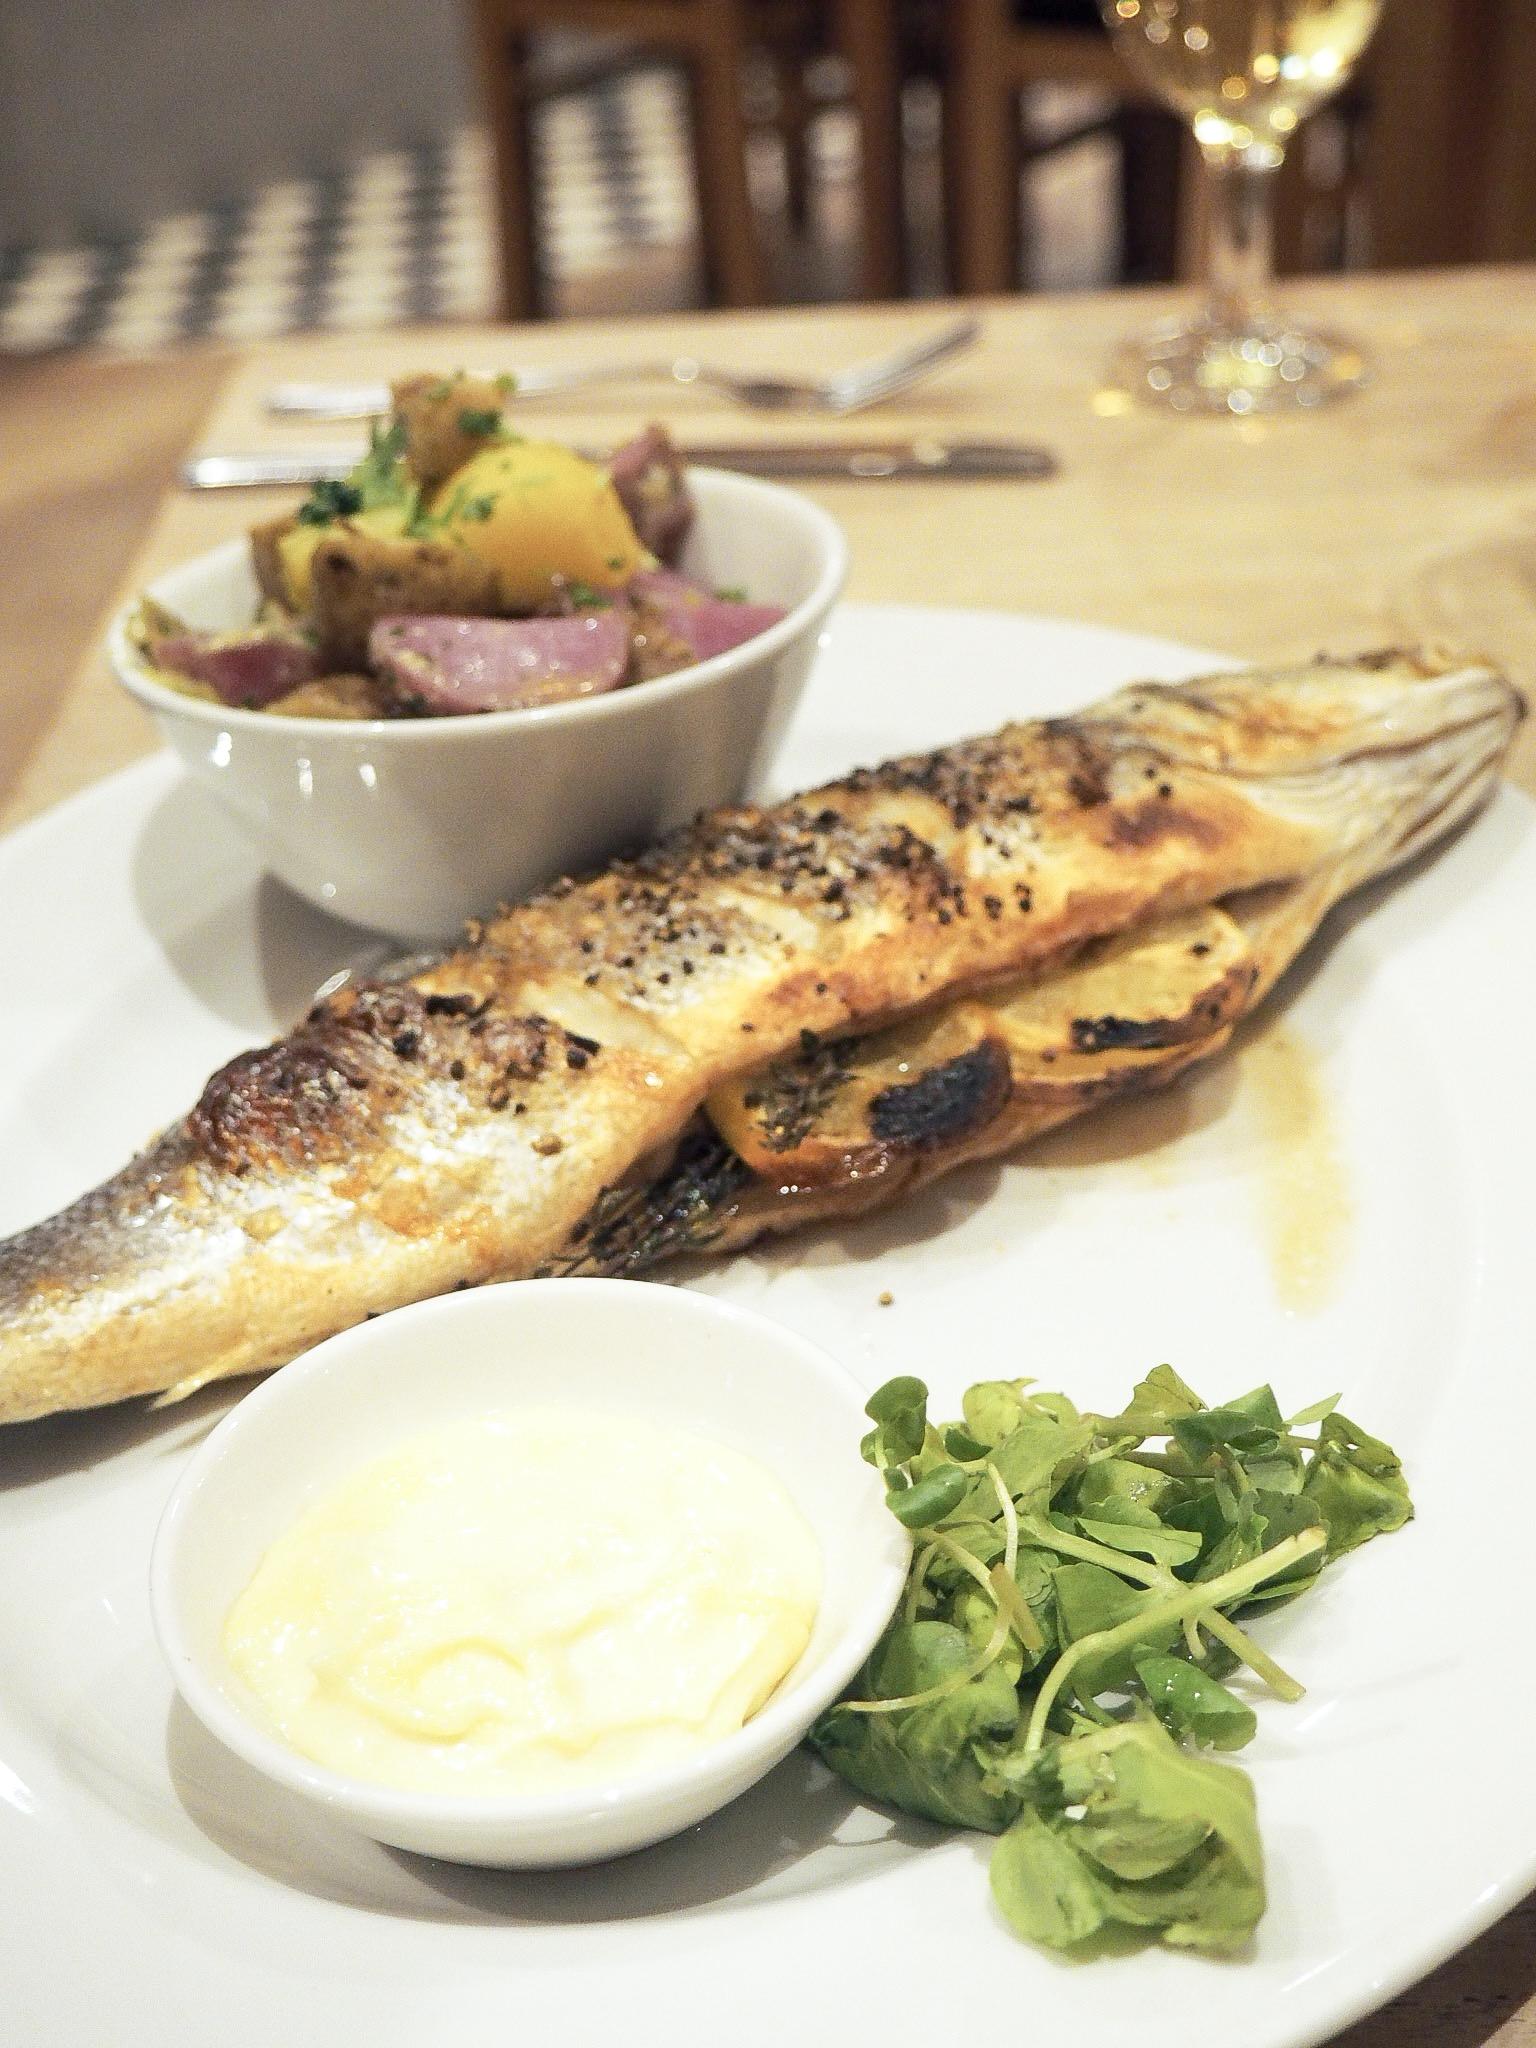 Loch Fyne roasted sea bass